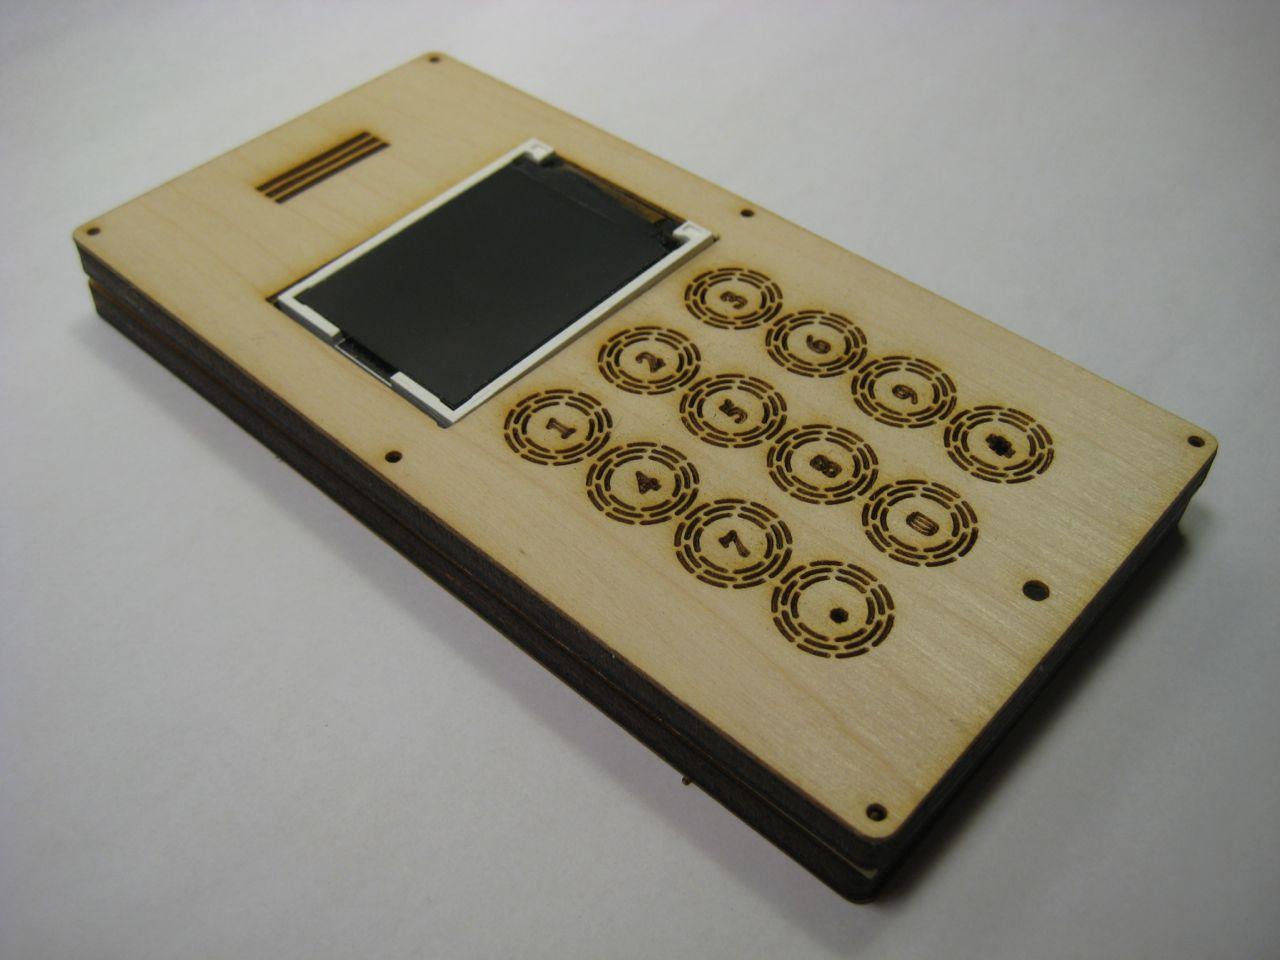 Uradi sam: napravi mobilni telefon